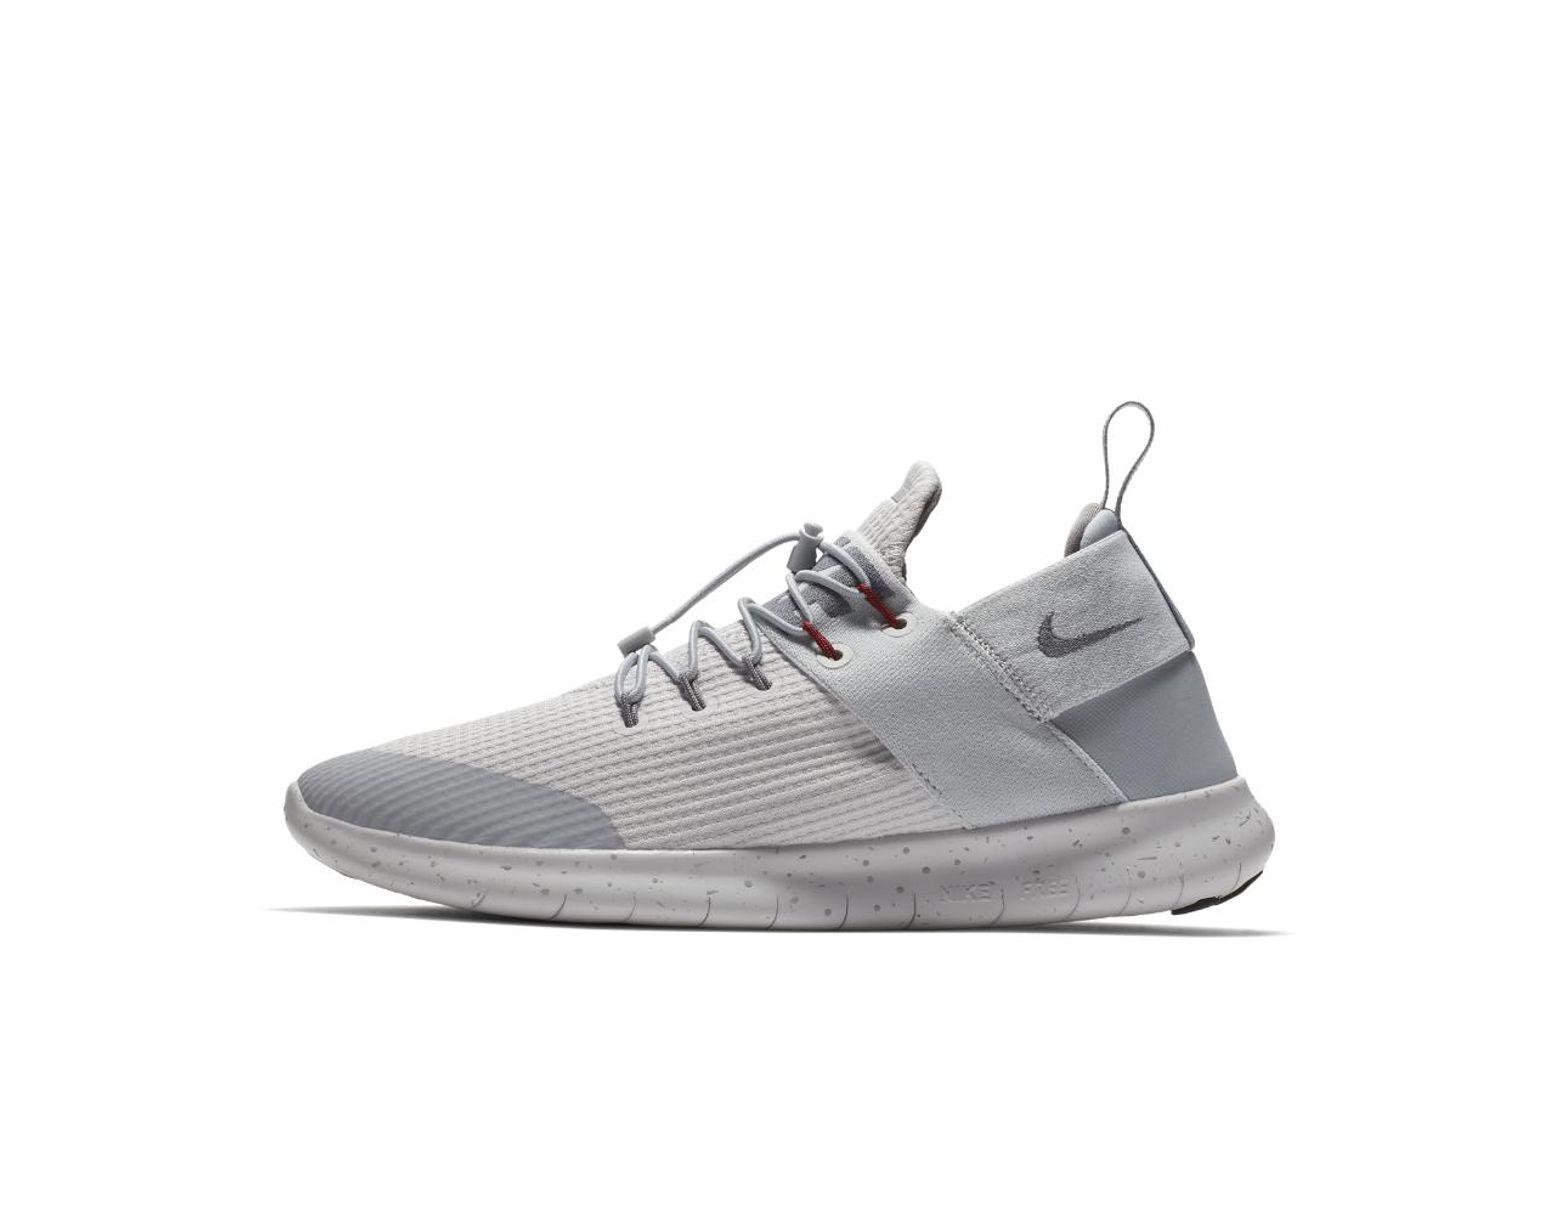 8f580f32ccddb Lyst - Nike Free Rn Commuter 2017 Utility Women s Running Shoe in Gray